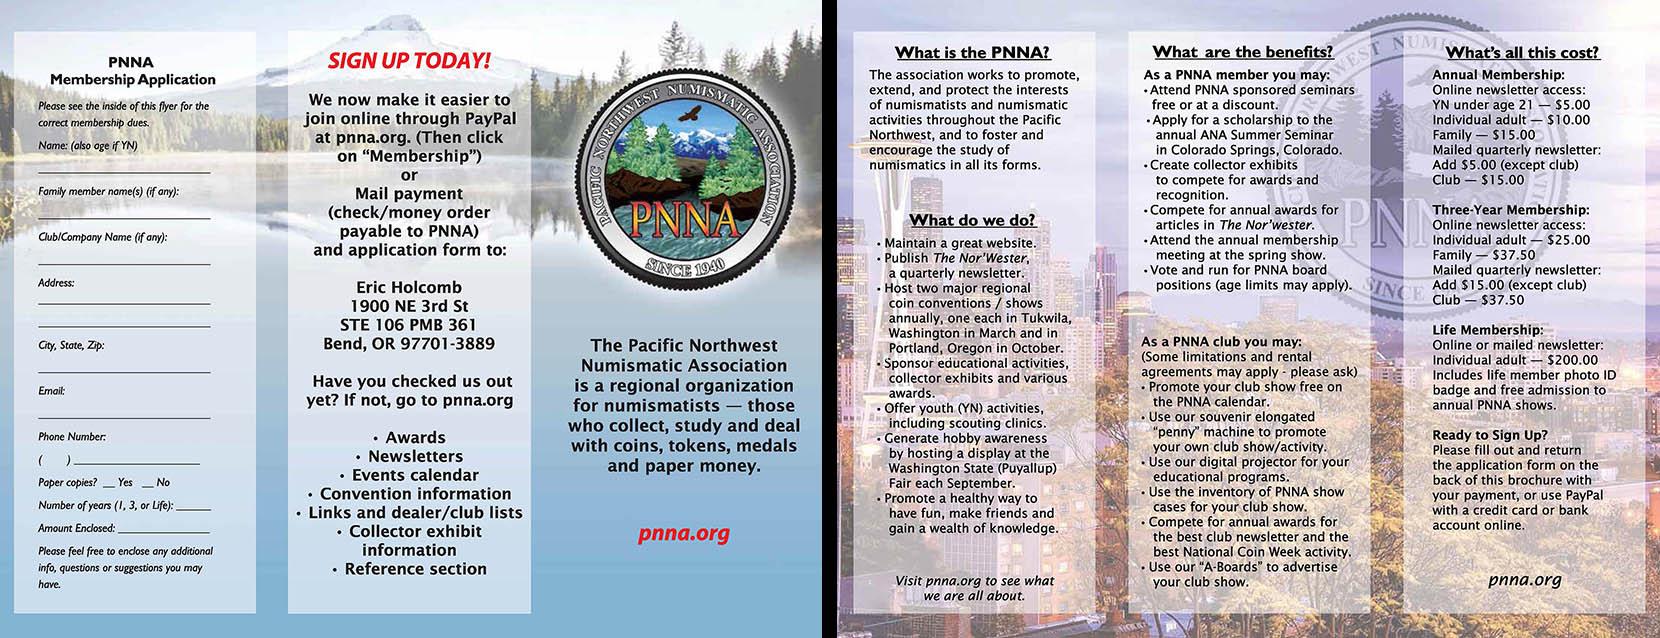 PNNA color membership brochure image